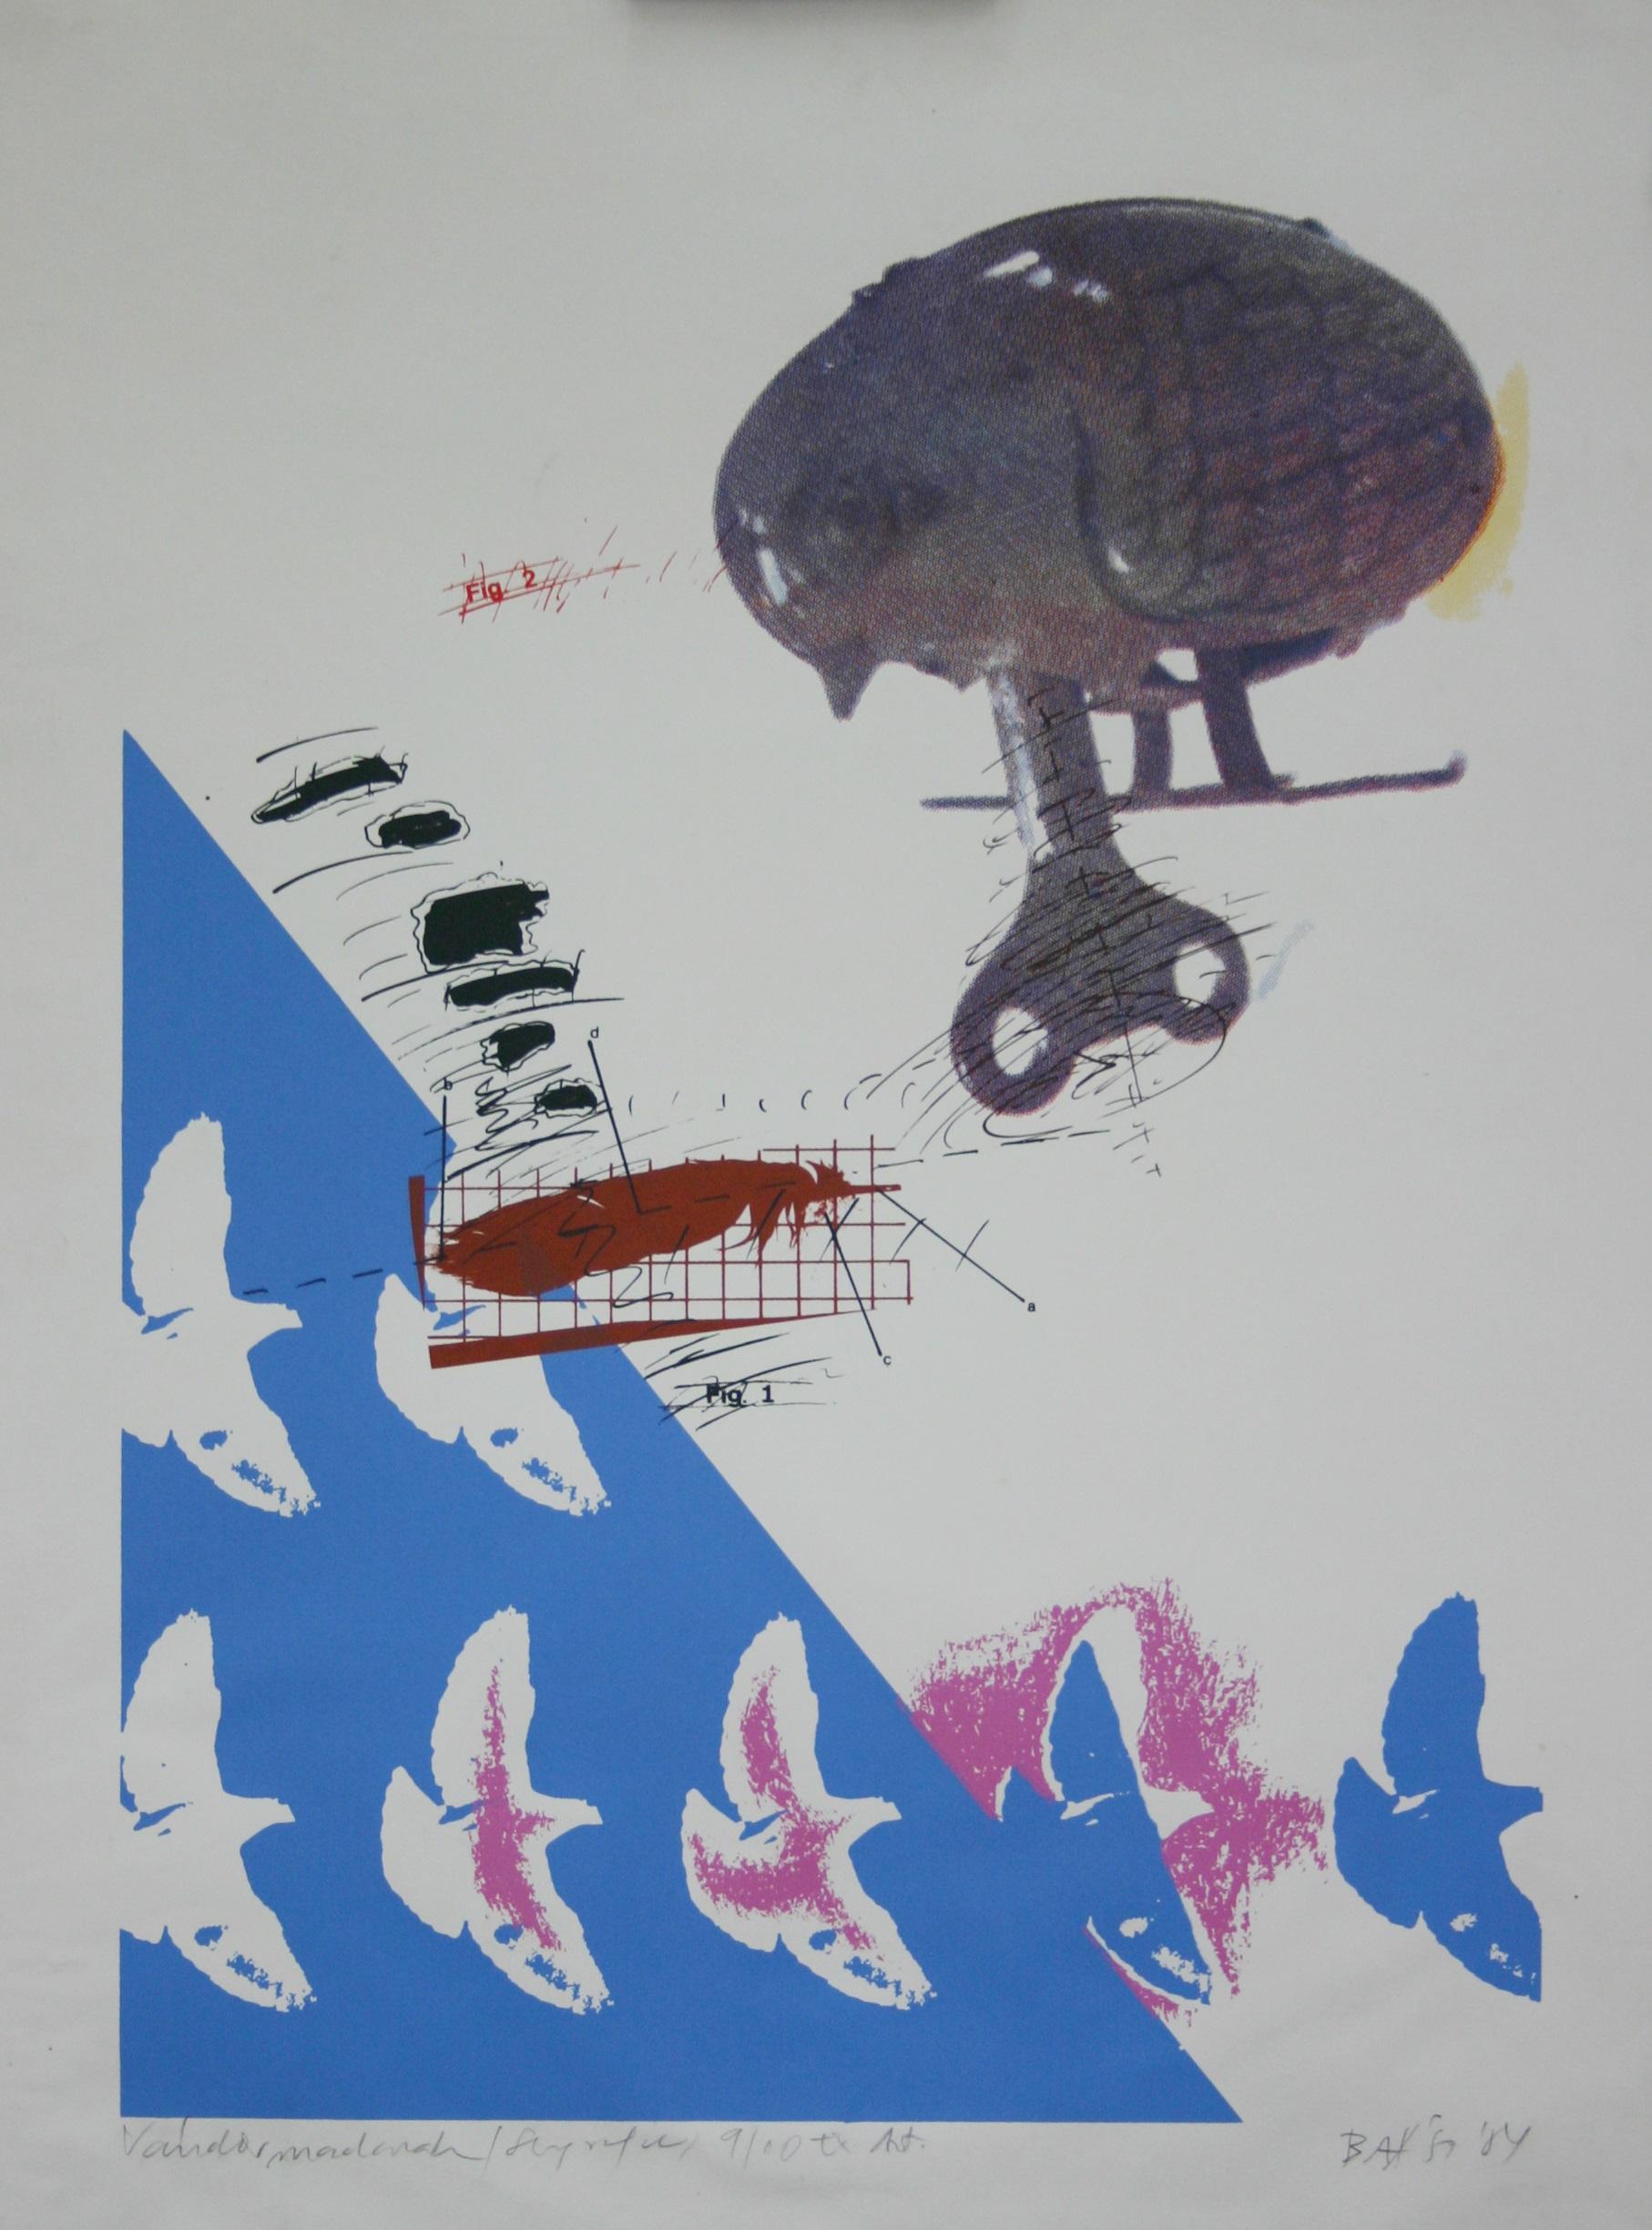 Imre Baász: Migrating Birds, silkscreen print, 54x35.5 cm, 1984